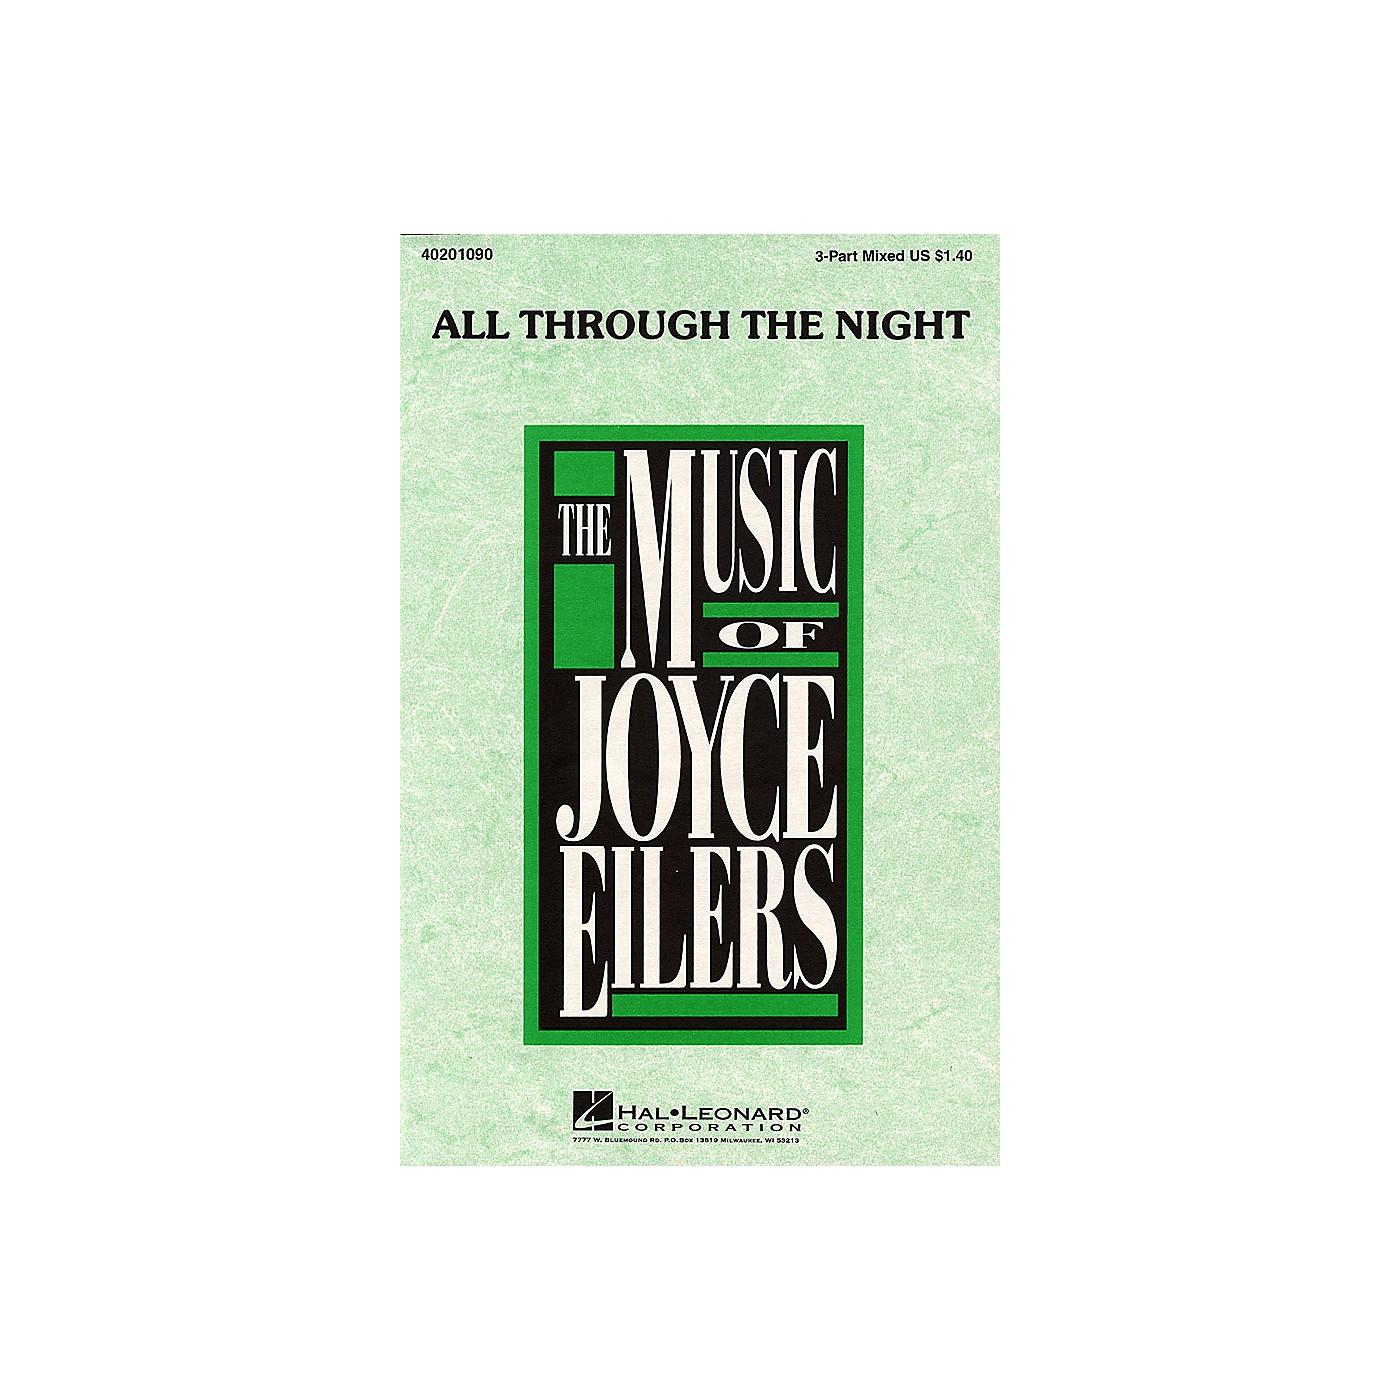 Hal Leonard All Through the Night (3-Part Mixed) 3-Part Mixed arranged by Joyce Eilers thumbnail